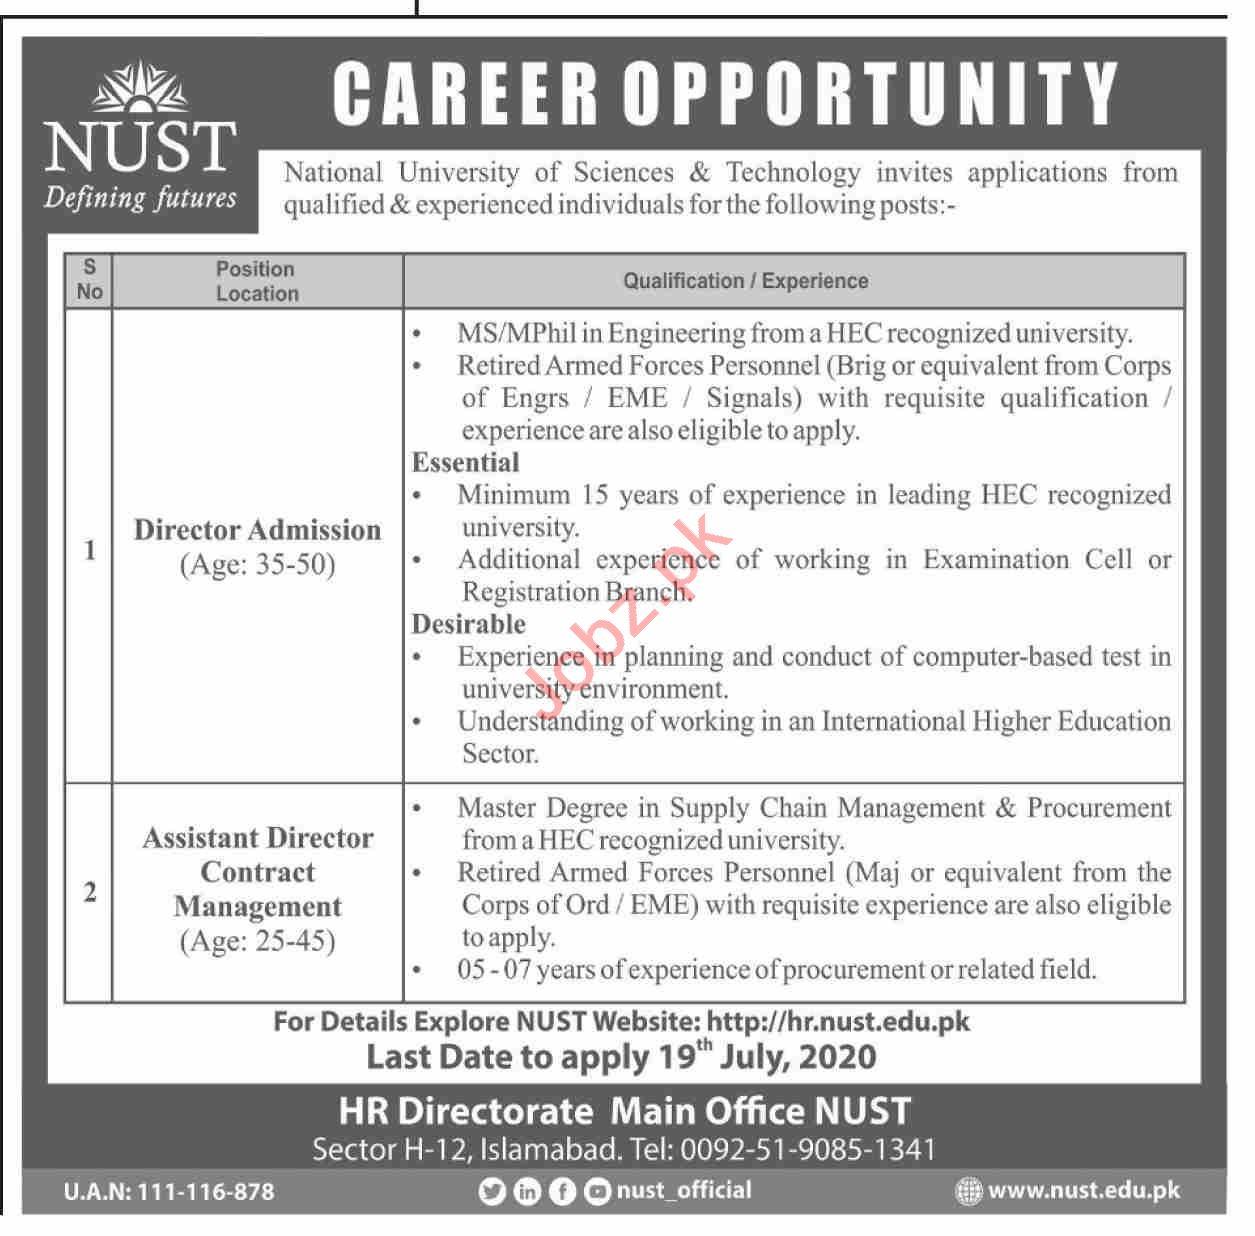 NUST University Jobs 2020 for Director & Assistant Director